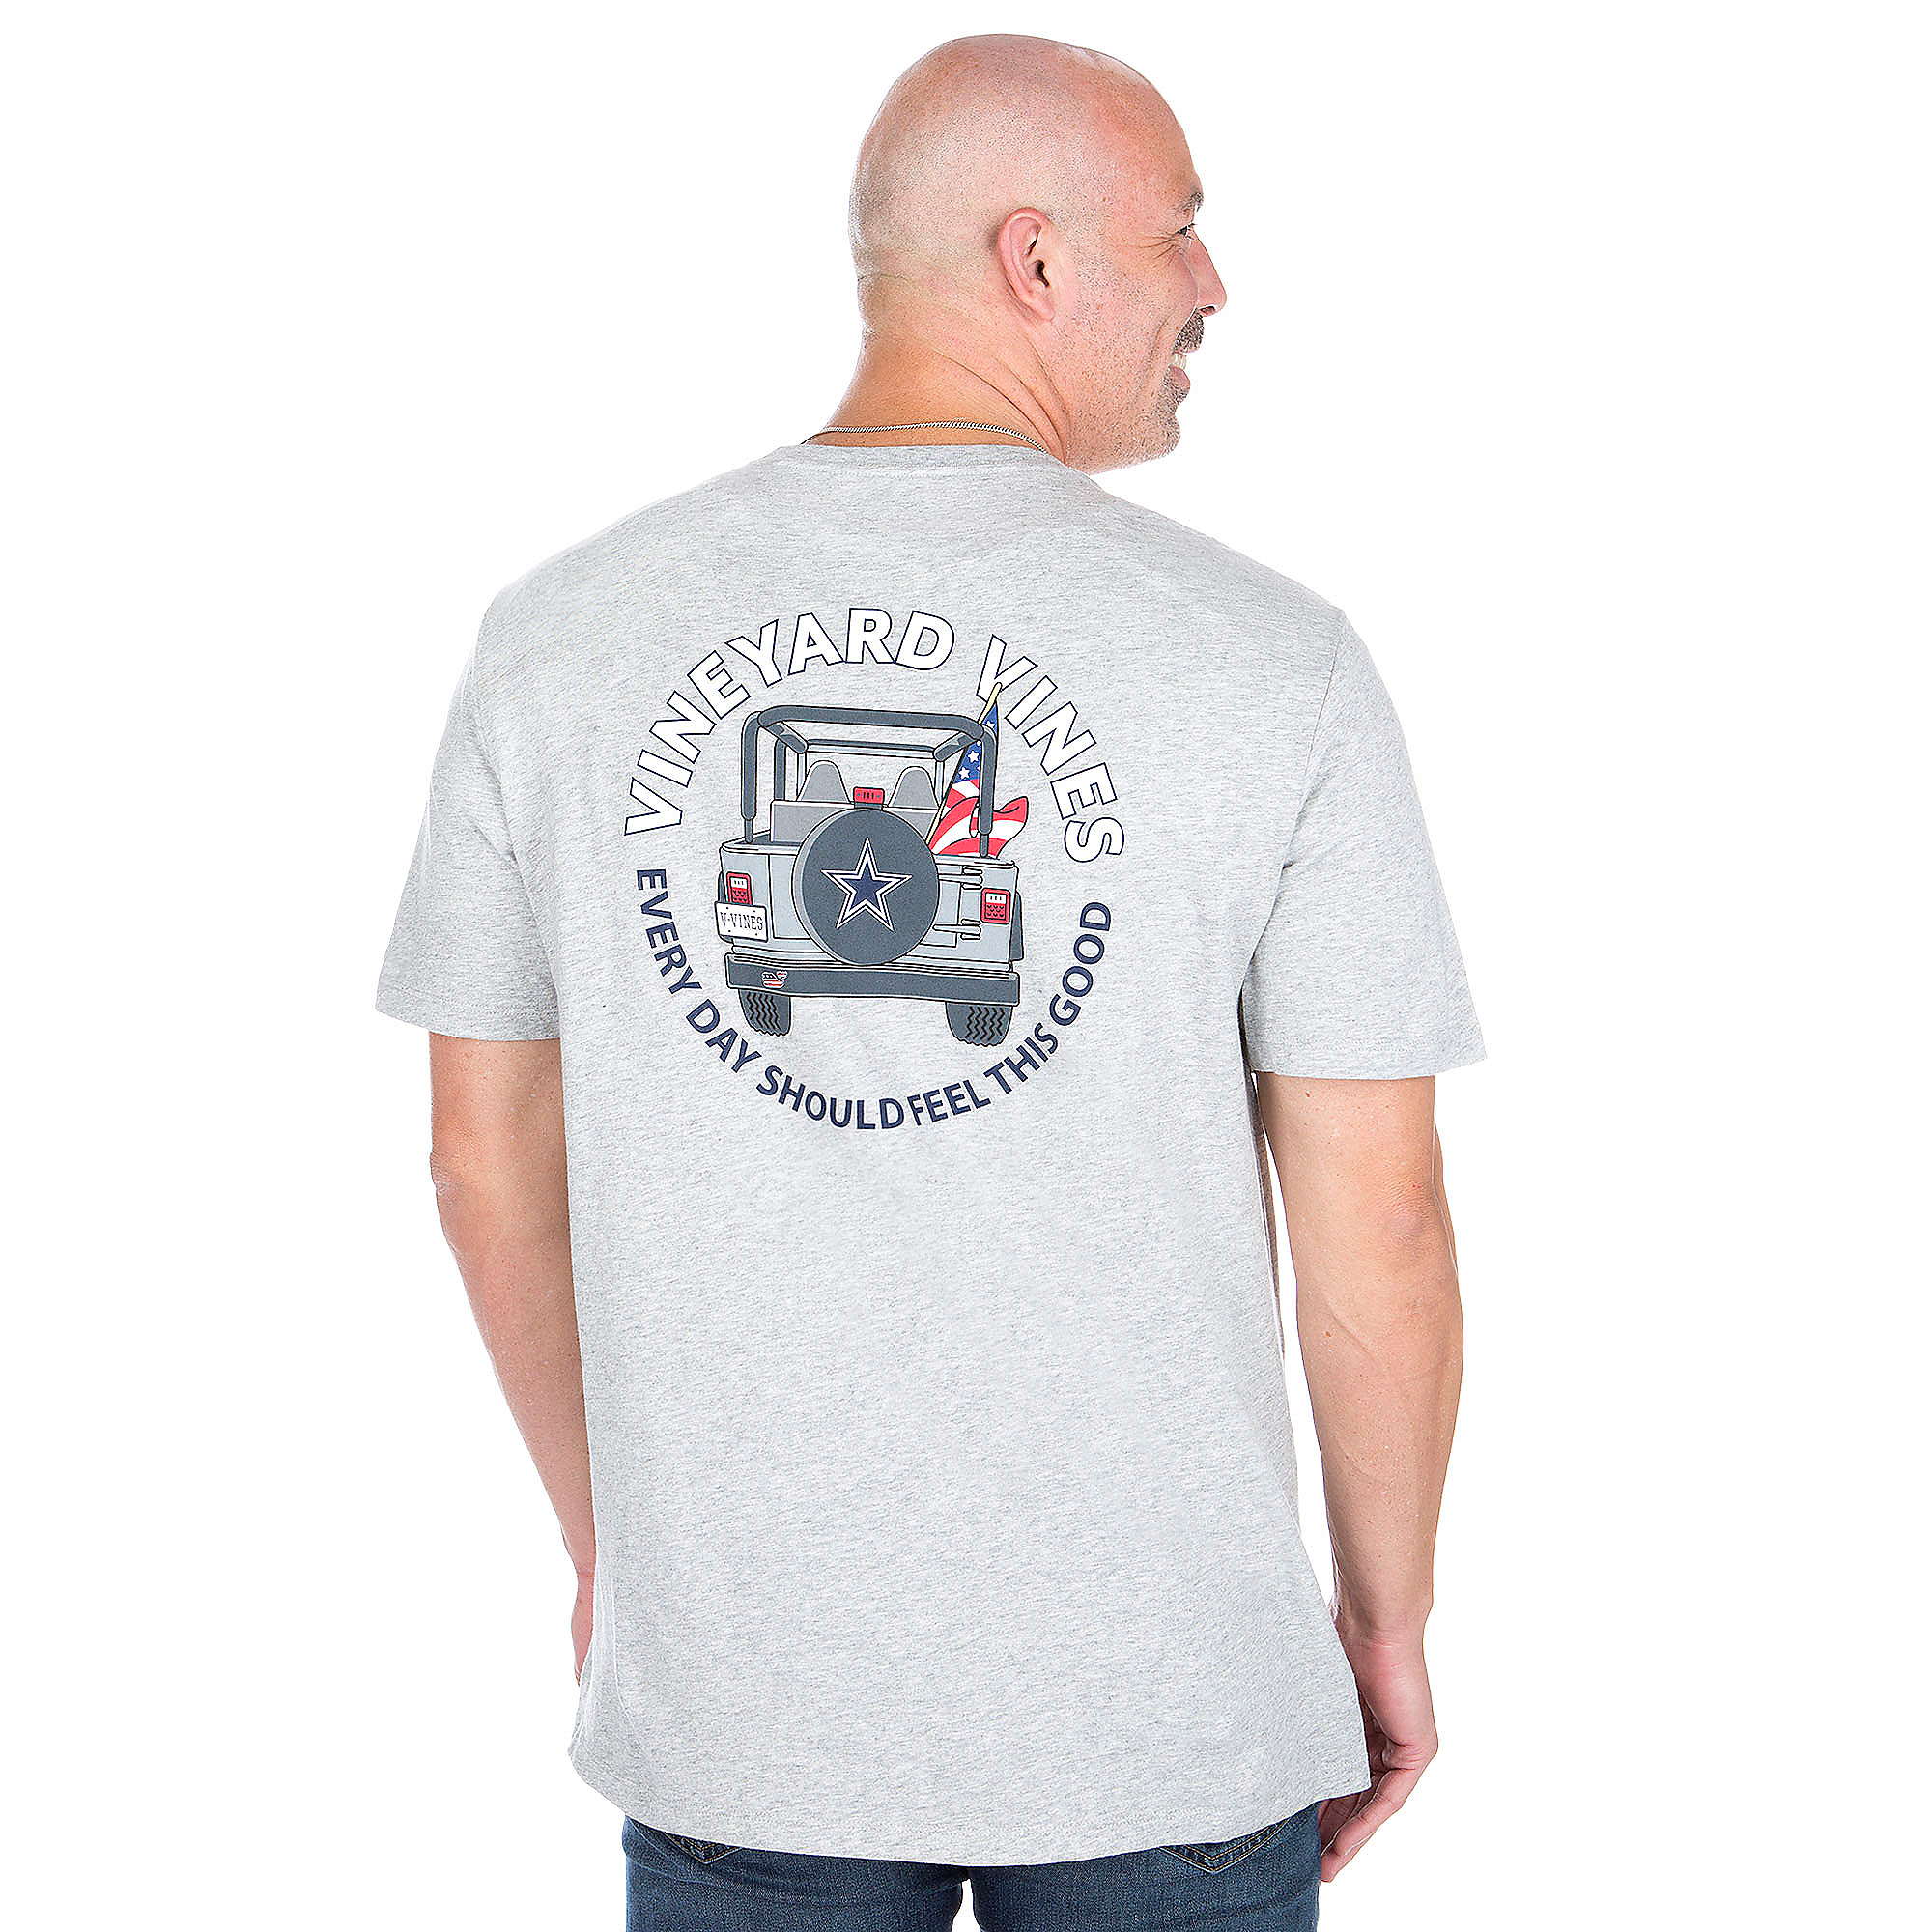 Dallas Cowboys Vineyard Vines Jeep Short Sleeve Tee